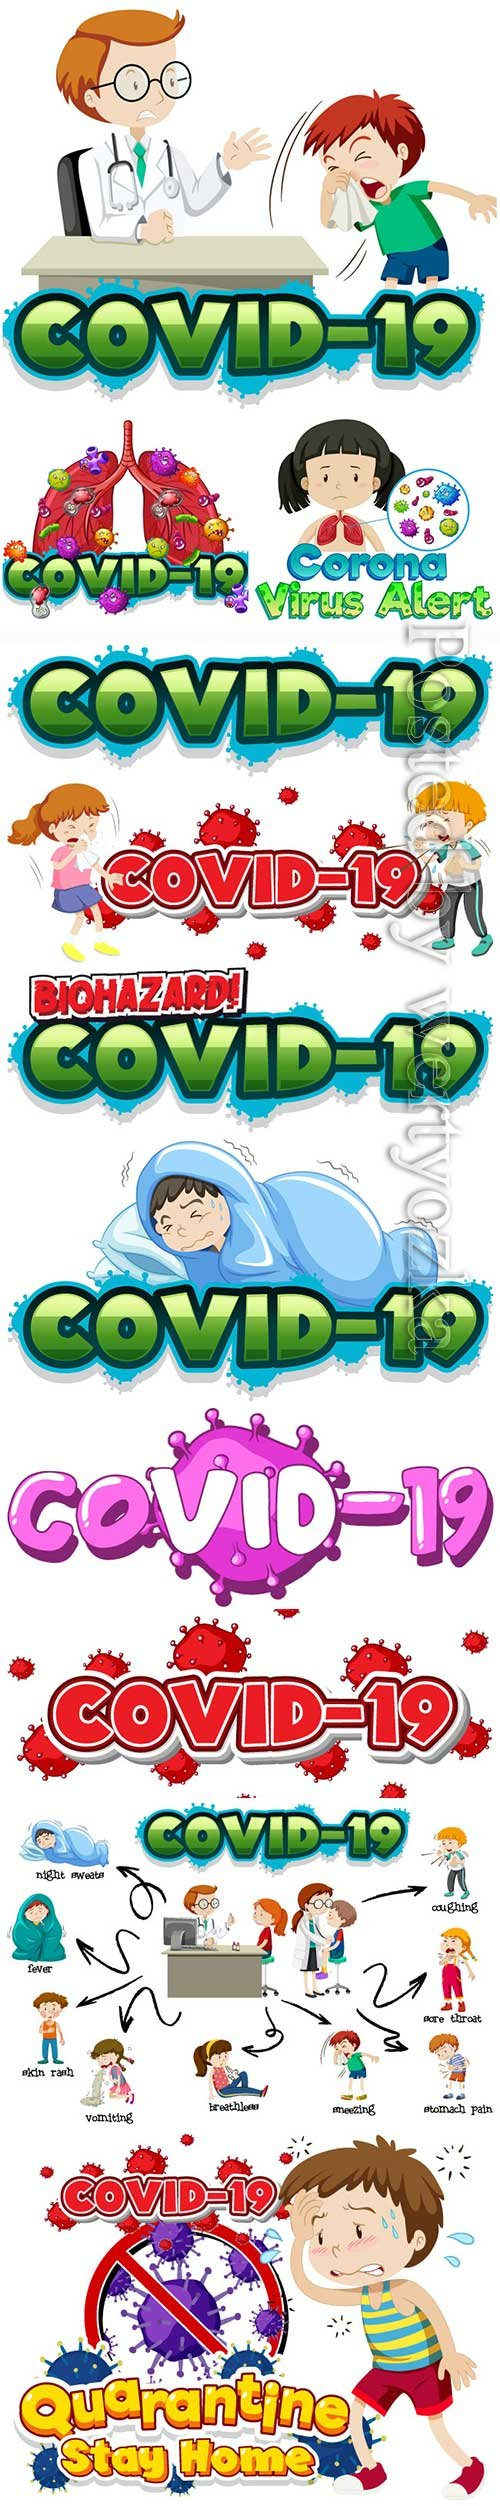 COVID 19, Coranavirus vector illustration sets # 20